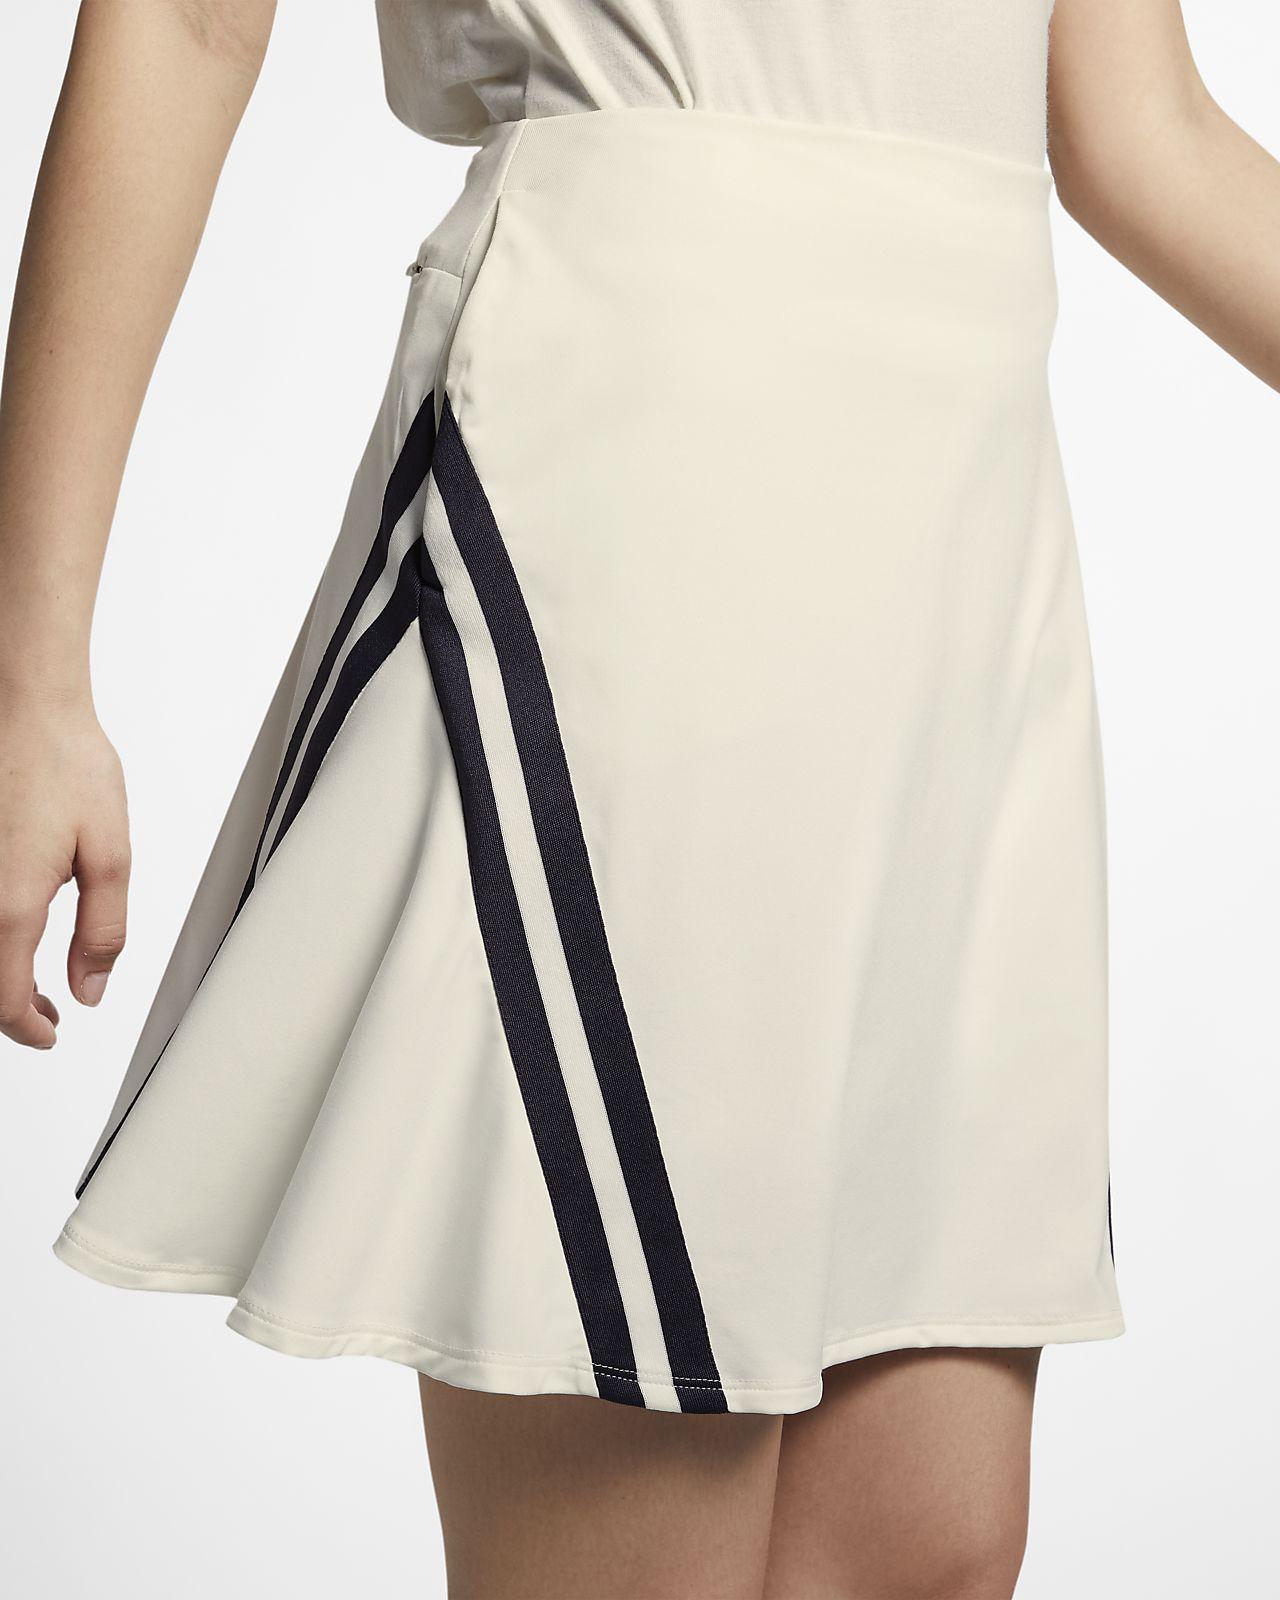 Nike Dri-FIT UV Women's 43cm (approx.) Golf Skirt